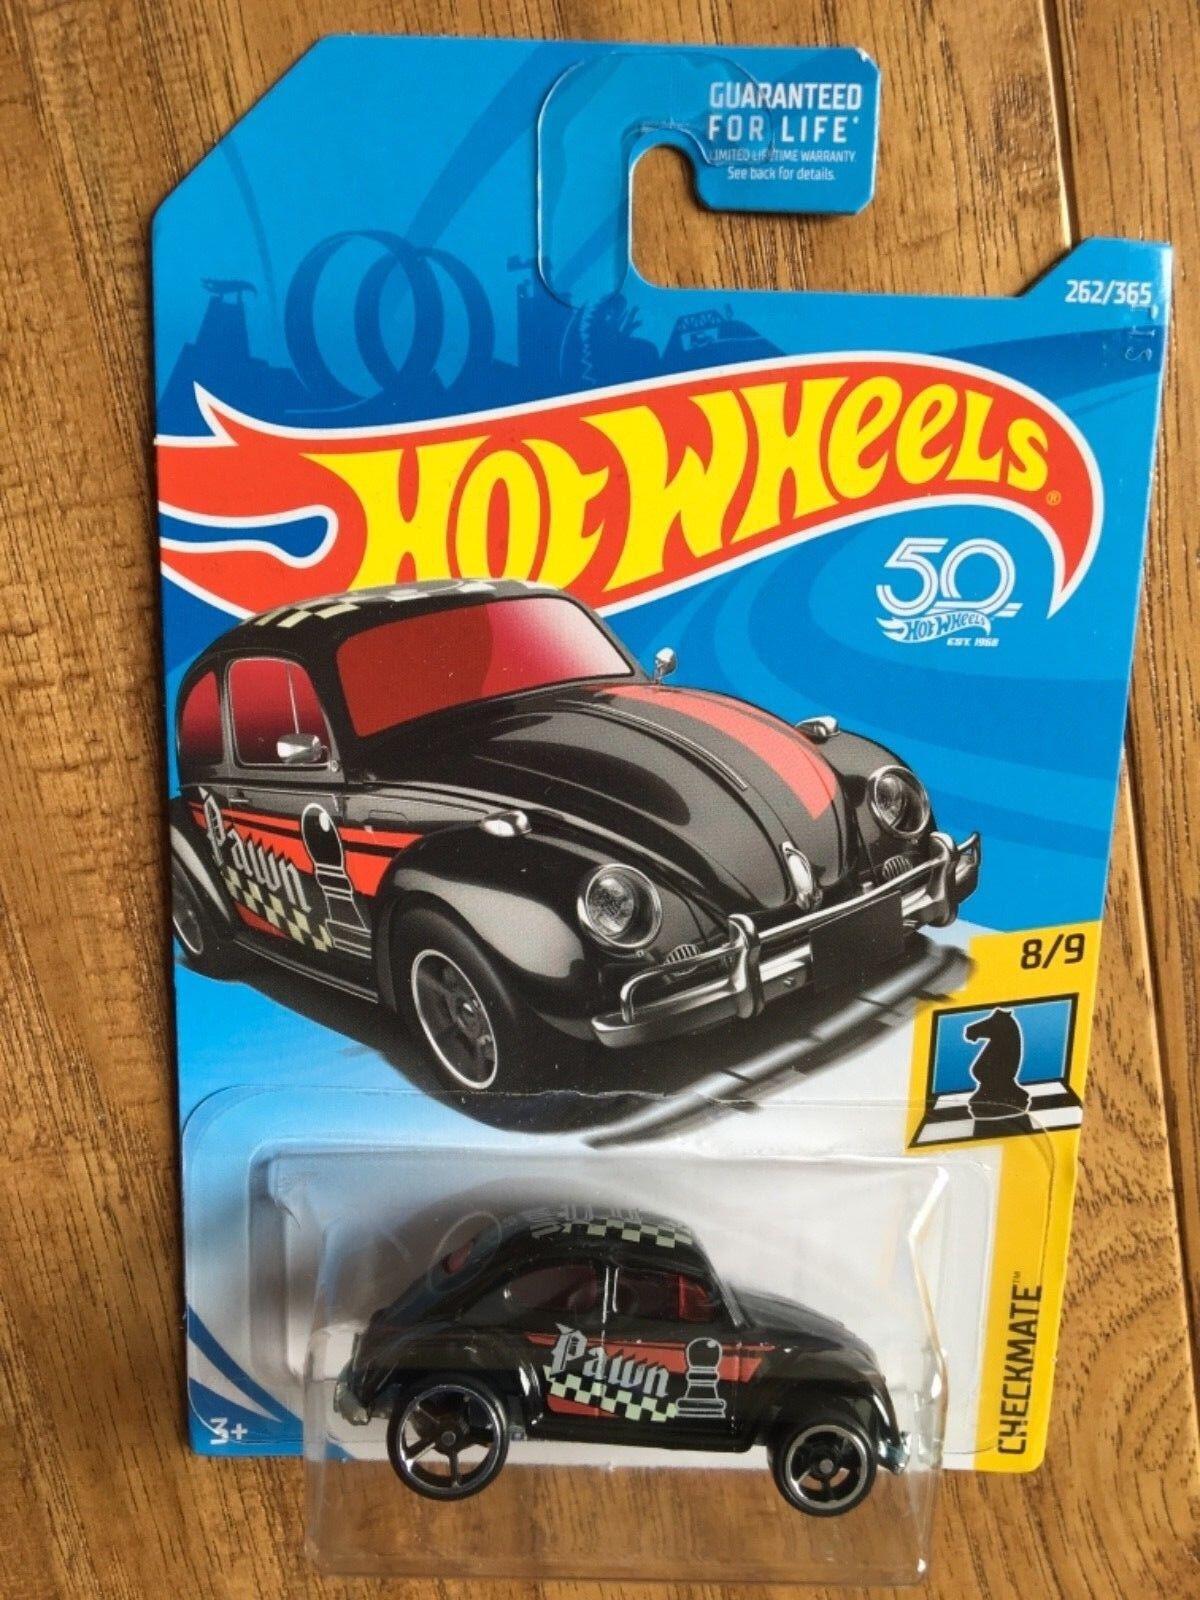 Hot Wheels 2018 50th Anniversary Checkmate King Kuda  261/36